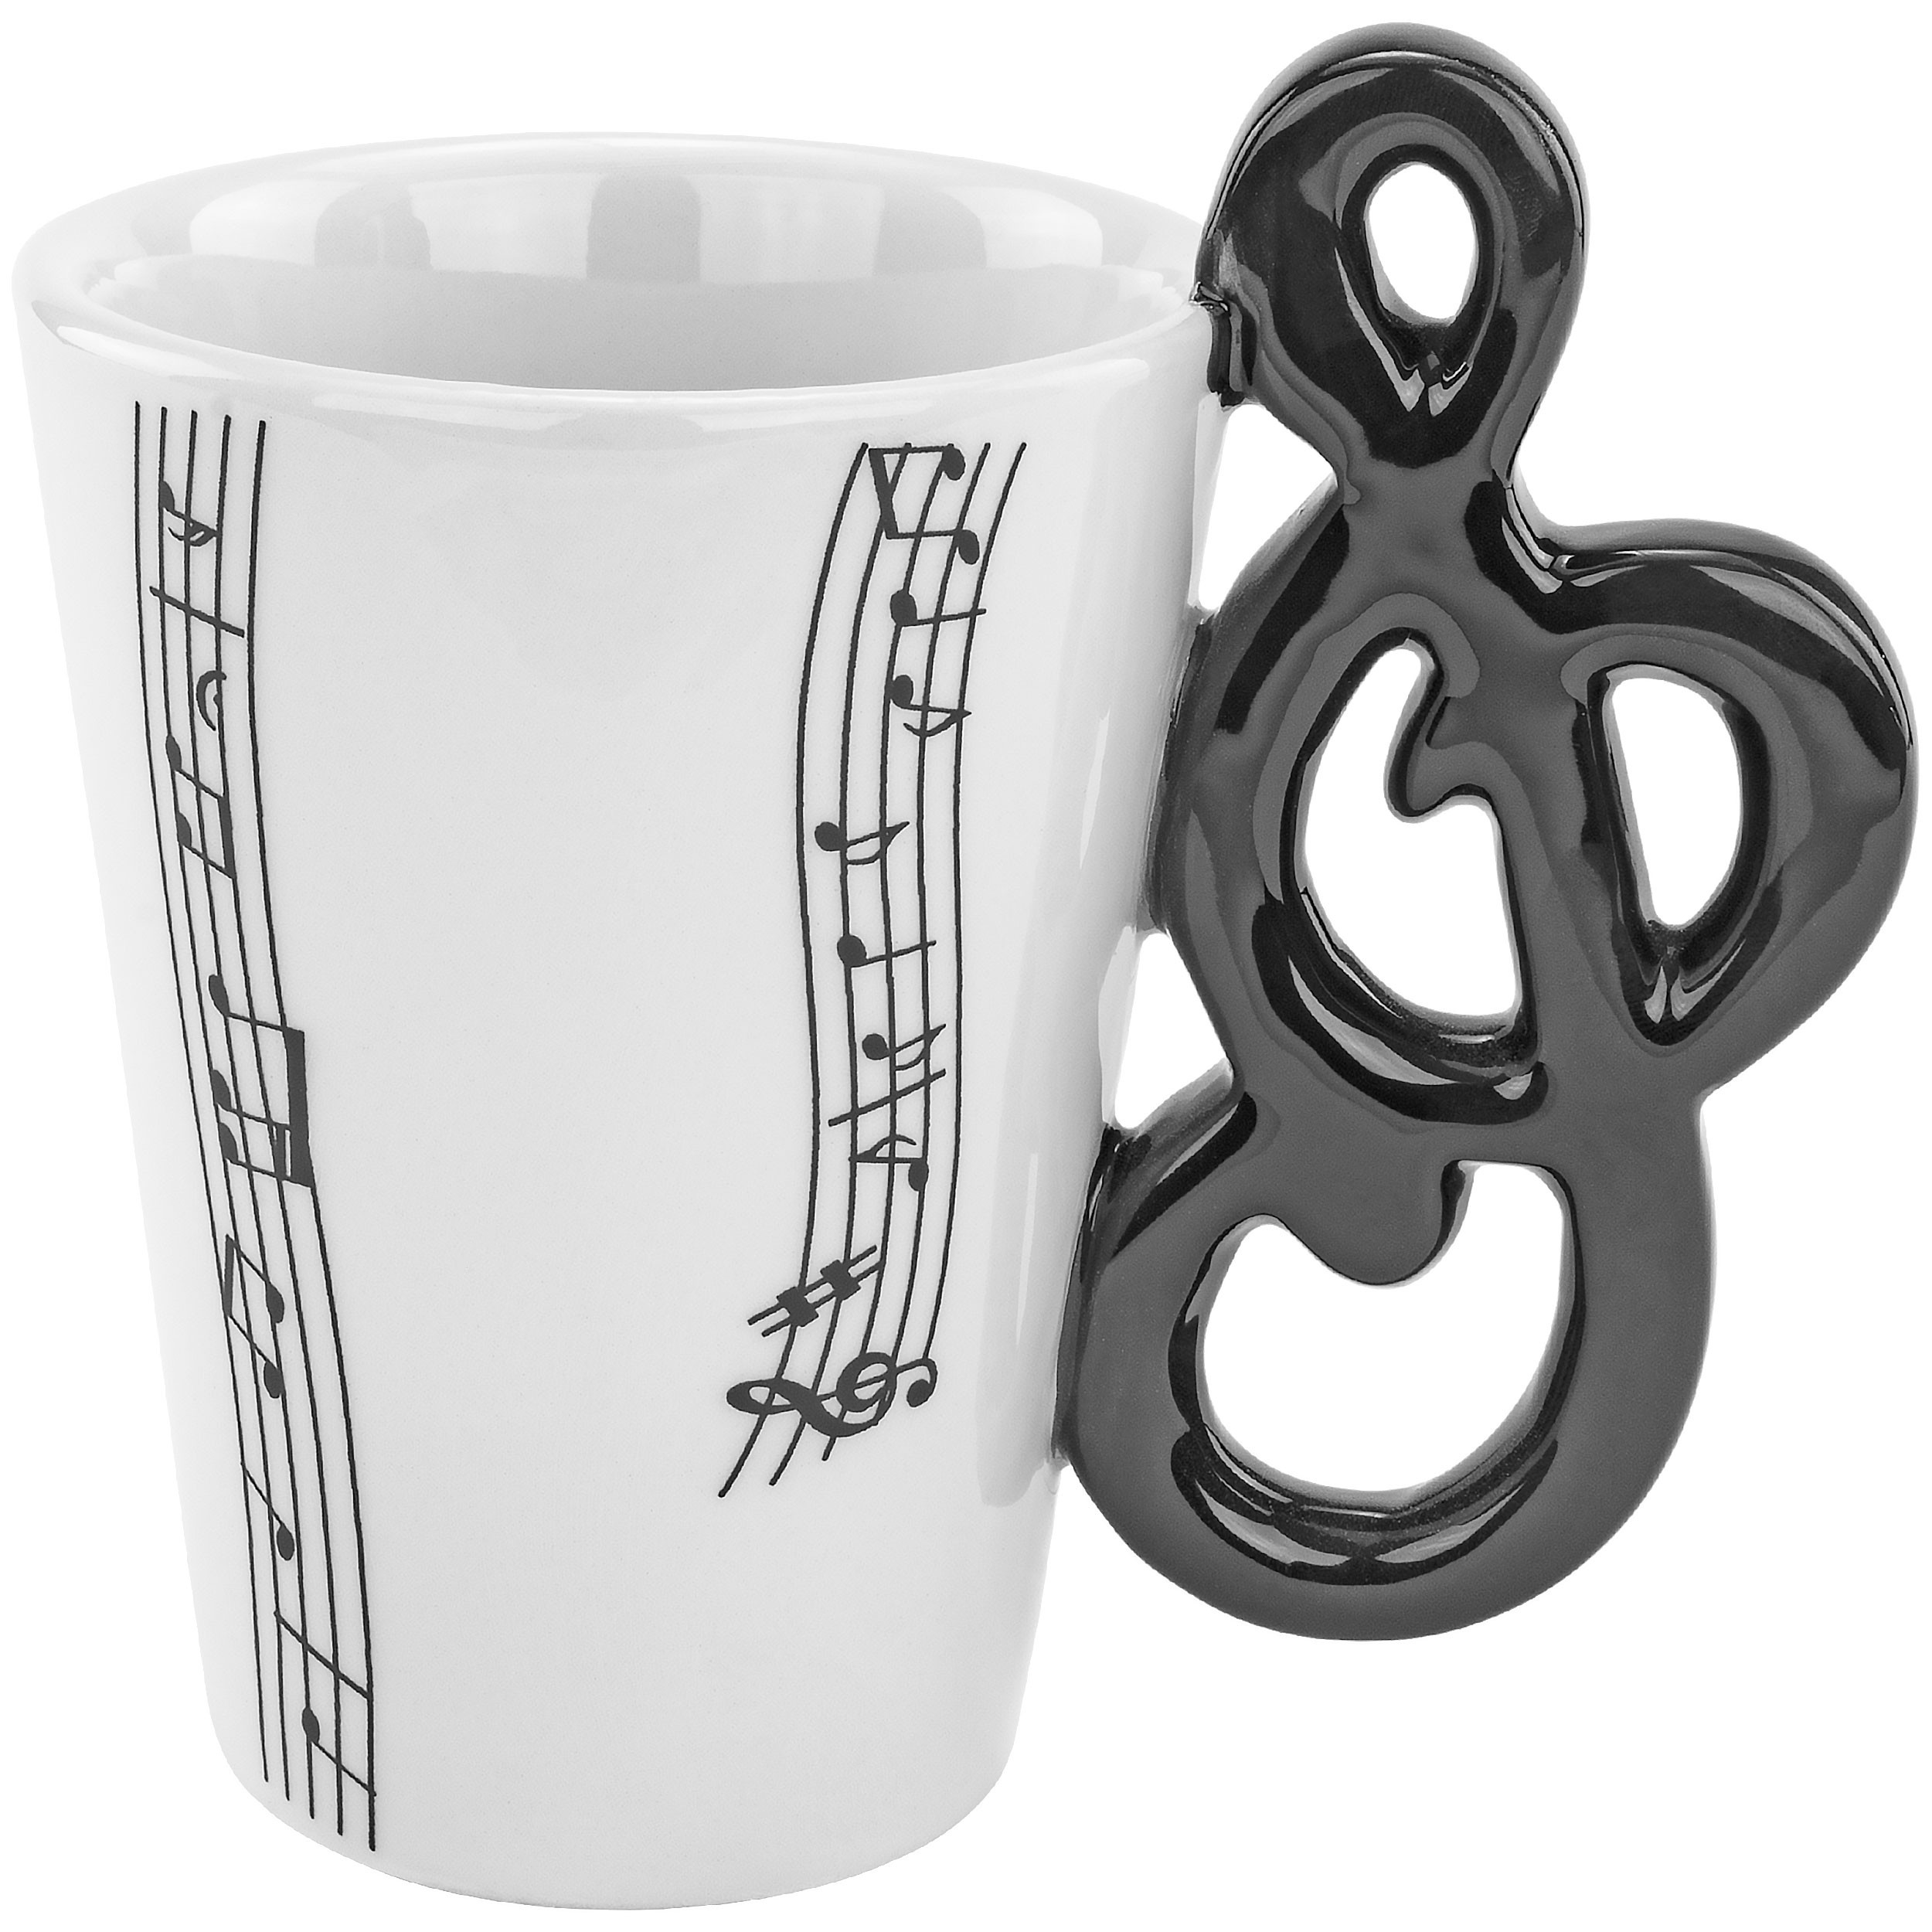 Fairly Odd Novelties FON-10211 Clef Note Musical Novelty Mug Fun Coffee Tea Band Gift, One Size, White